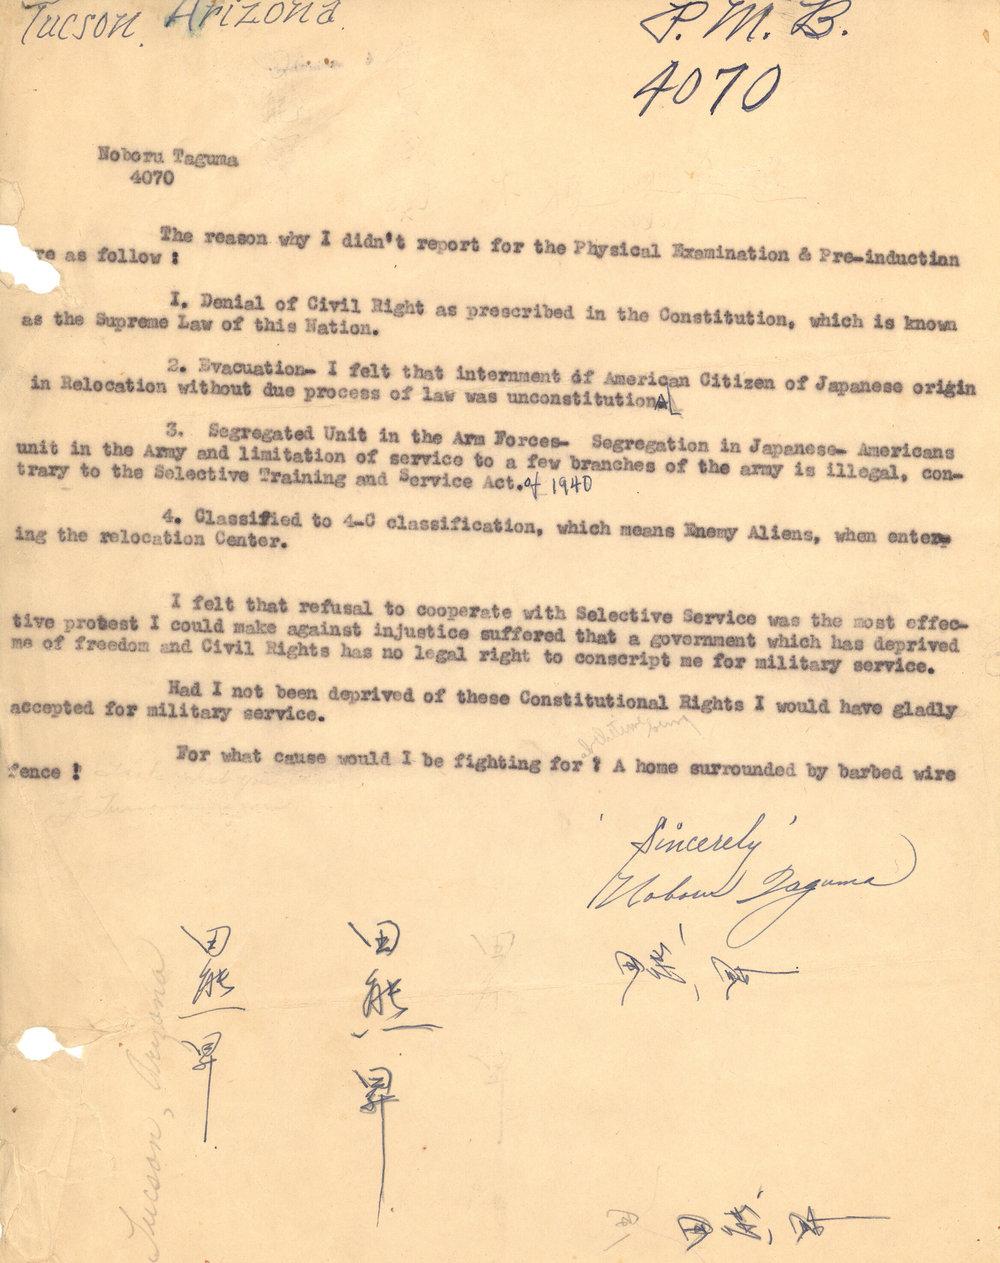 Noboru Taguma's reasons for resisting the military draft.  Courtesy of Kenji G. Taguma